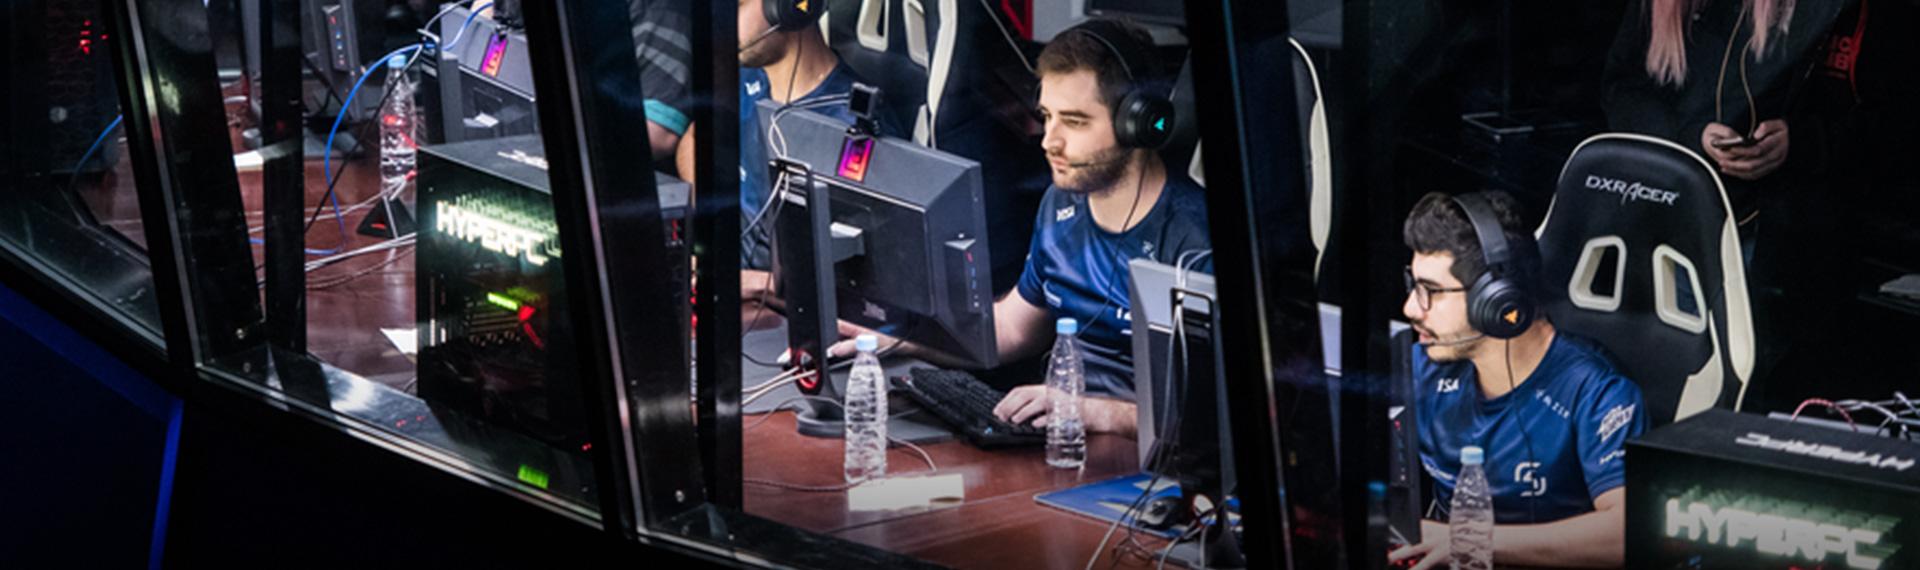 3 Fakta Esports yang Bikin Kamu Semangat Jadi Gamer Profesional